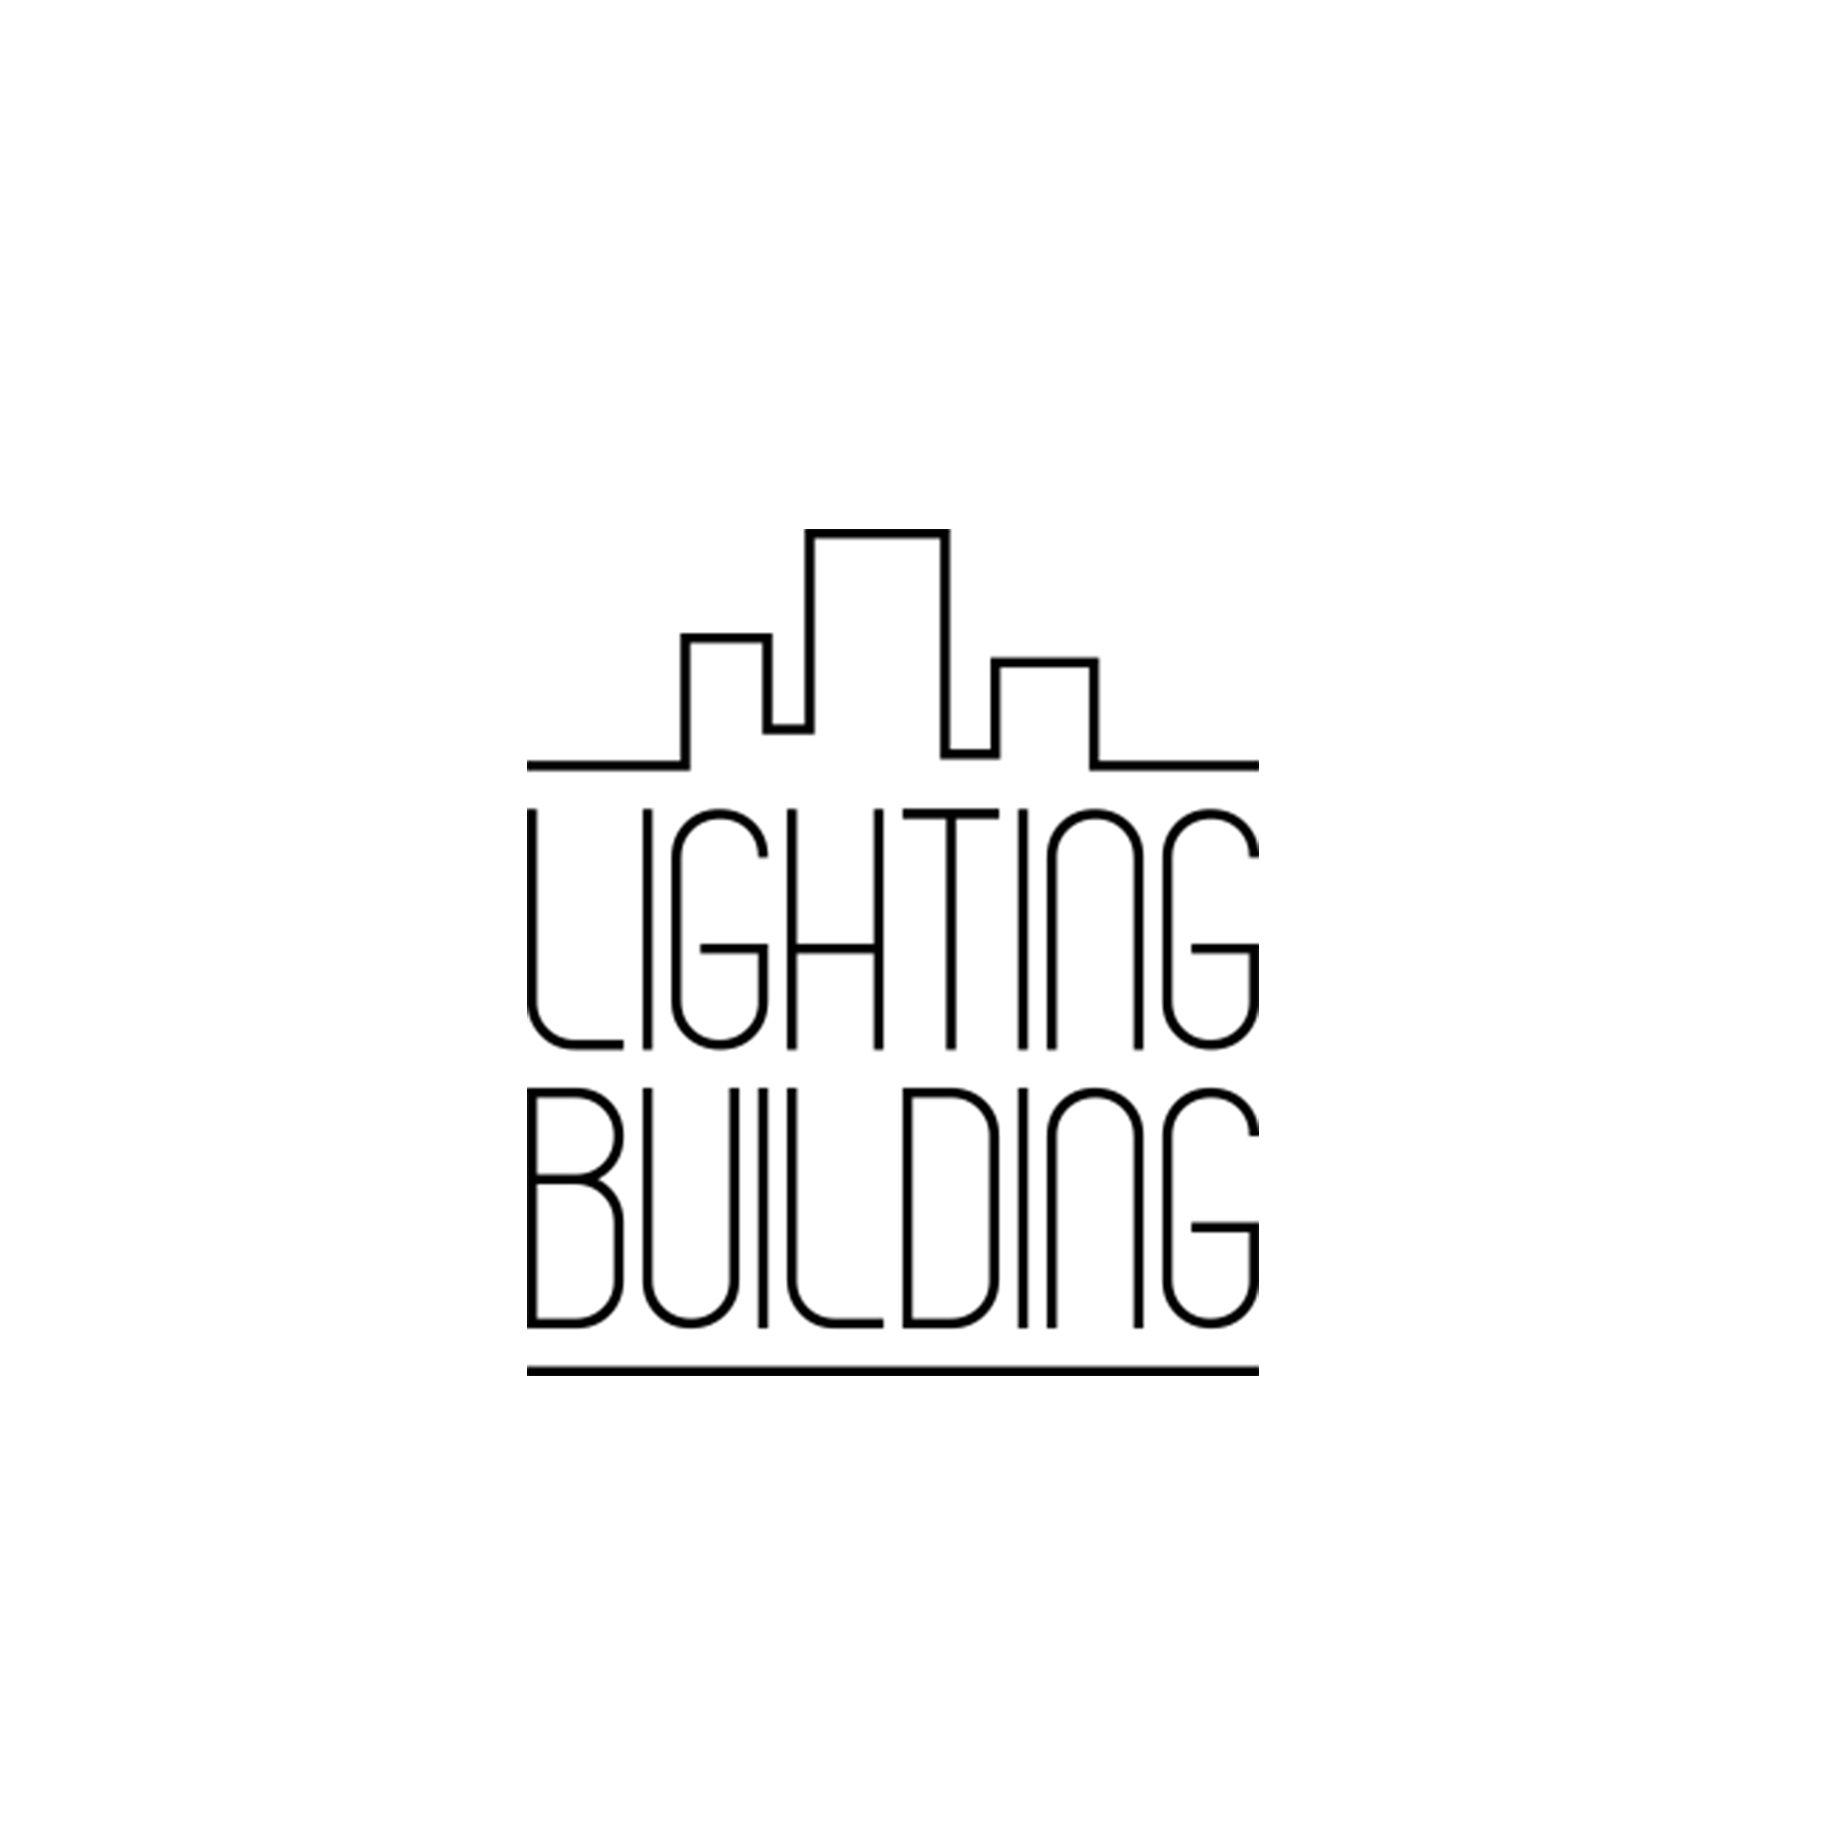 Lighting&Building